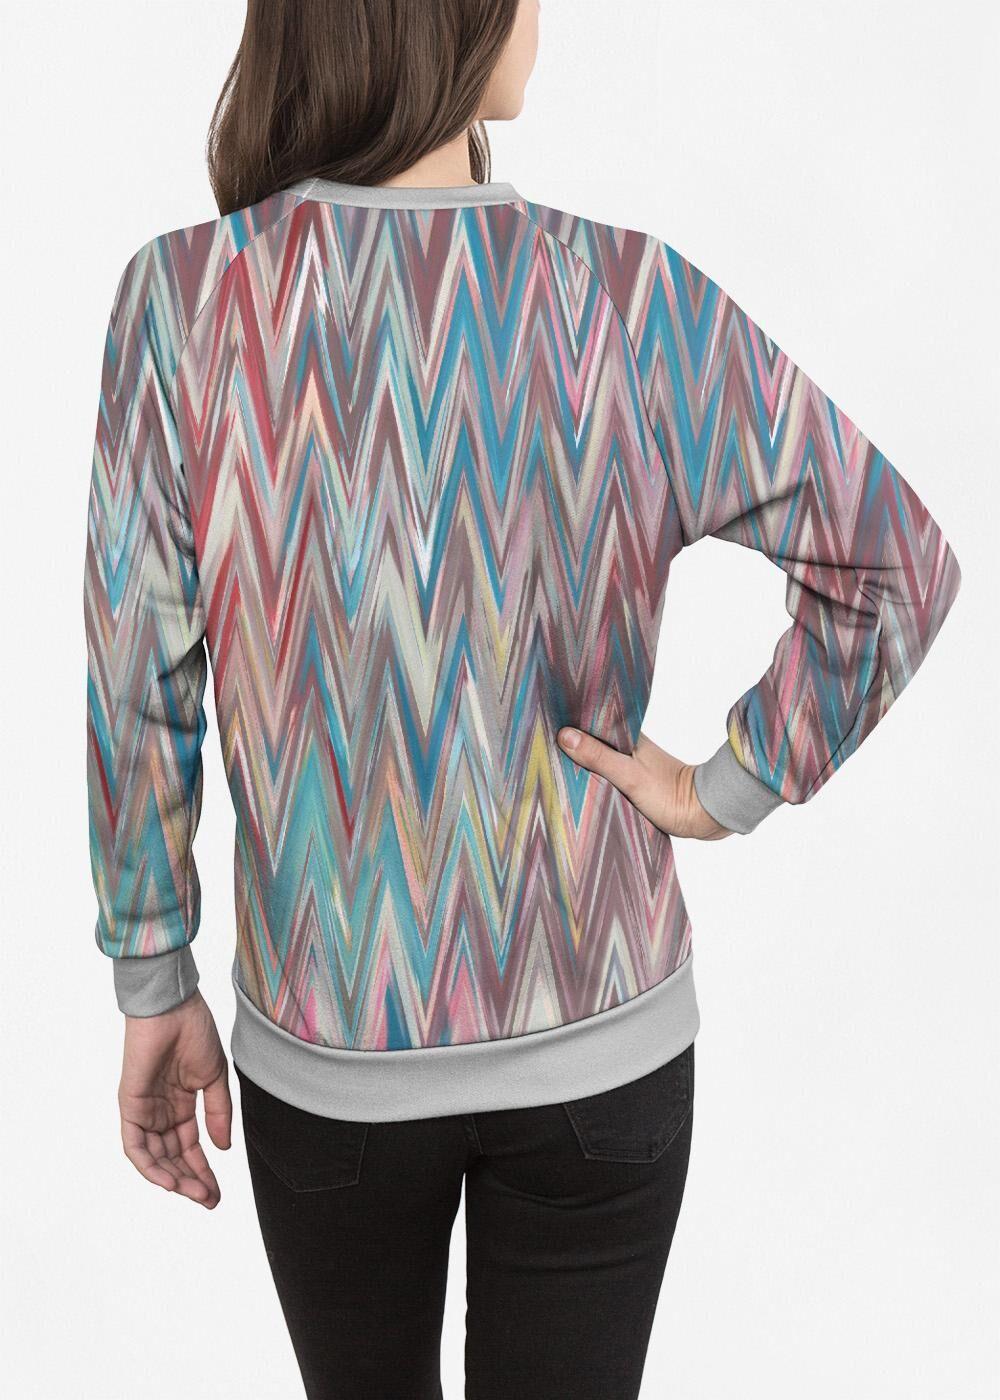 Women's Crewneck Sweatshirt - Fashion Waves in Blue/Pink by VIDA Original Artist  - Size: Grey / 1X